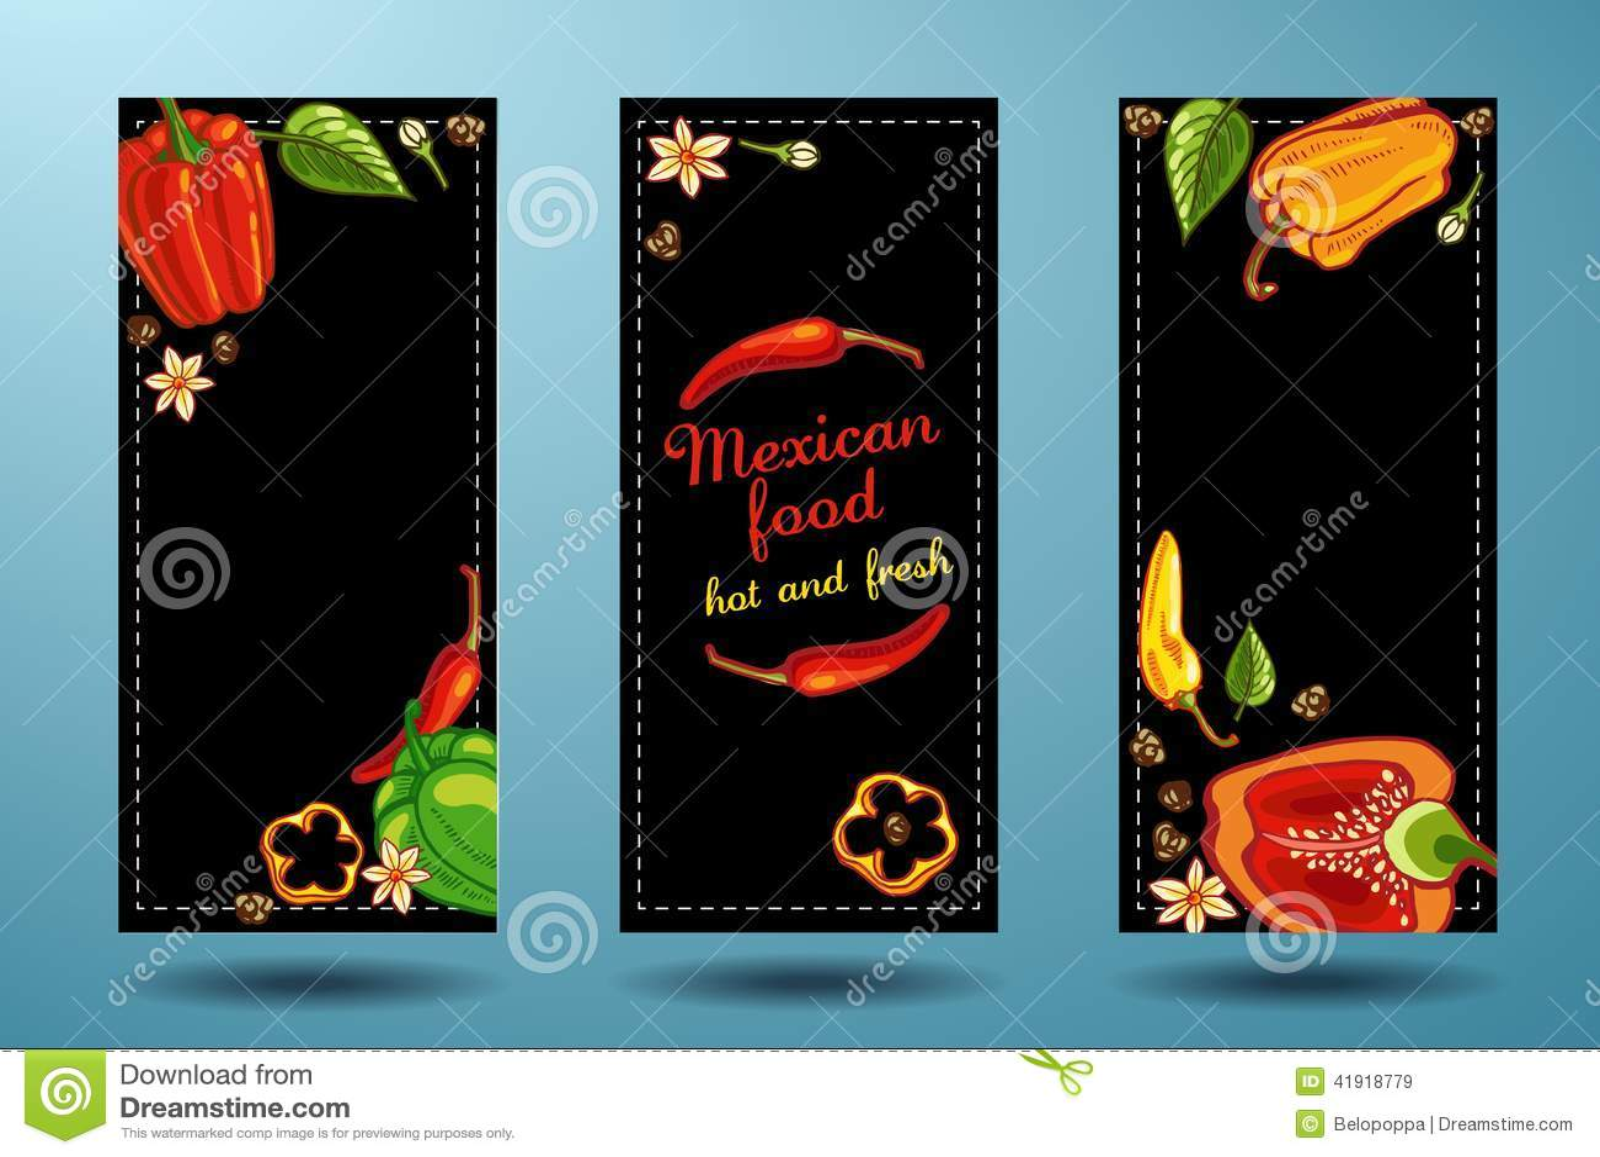 Print Restaurant Menu Prices